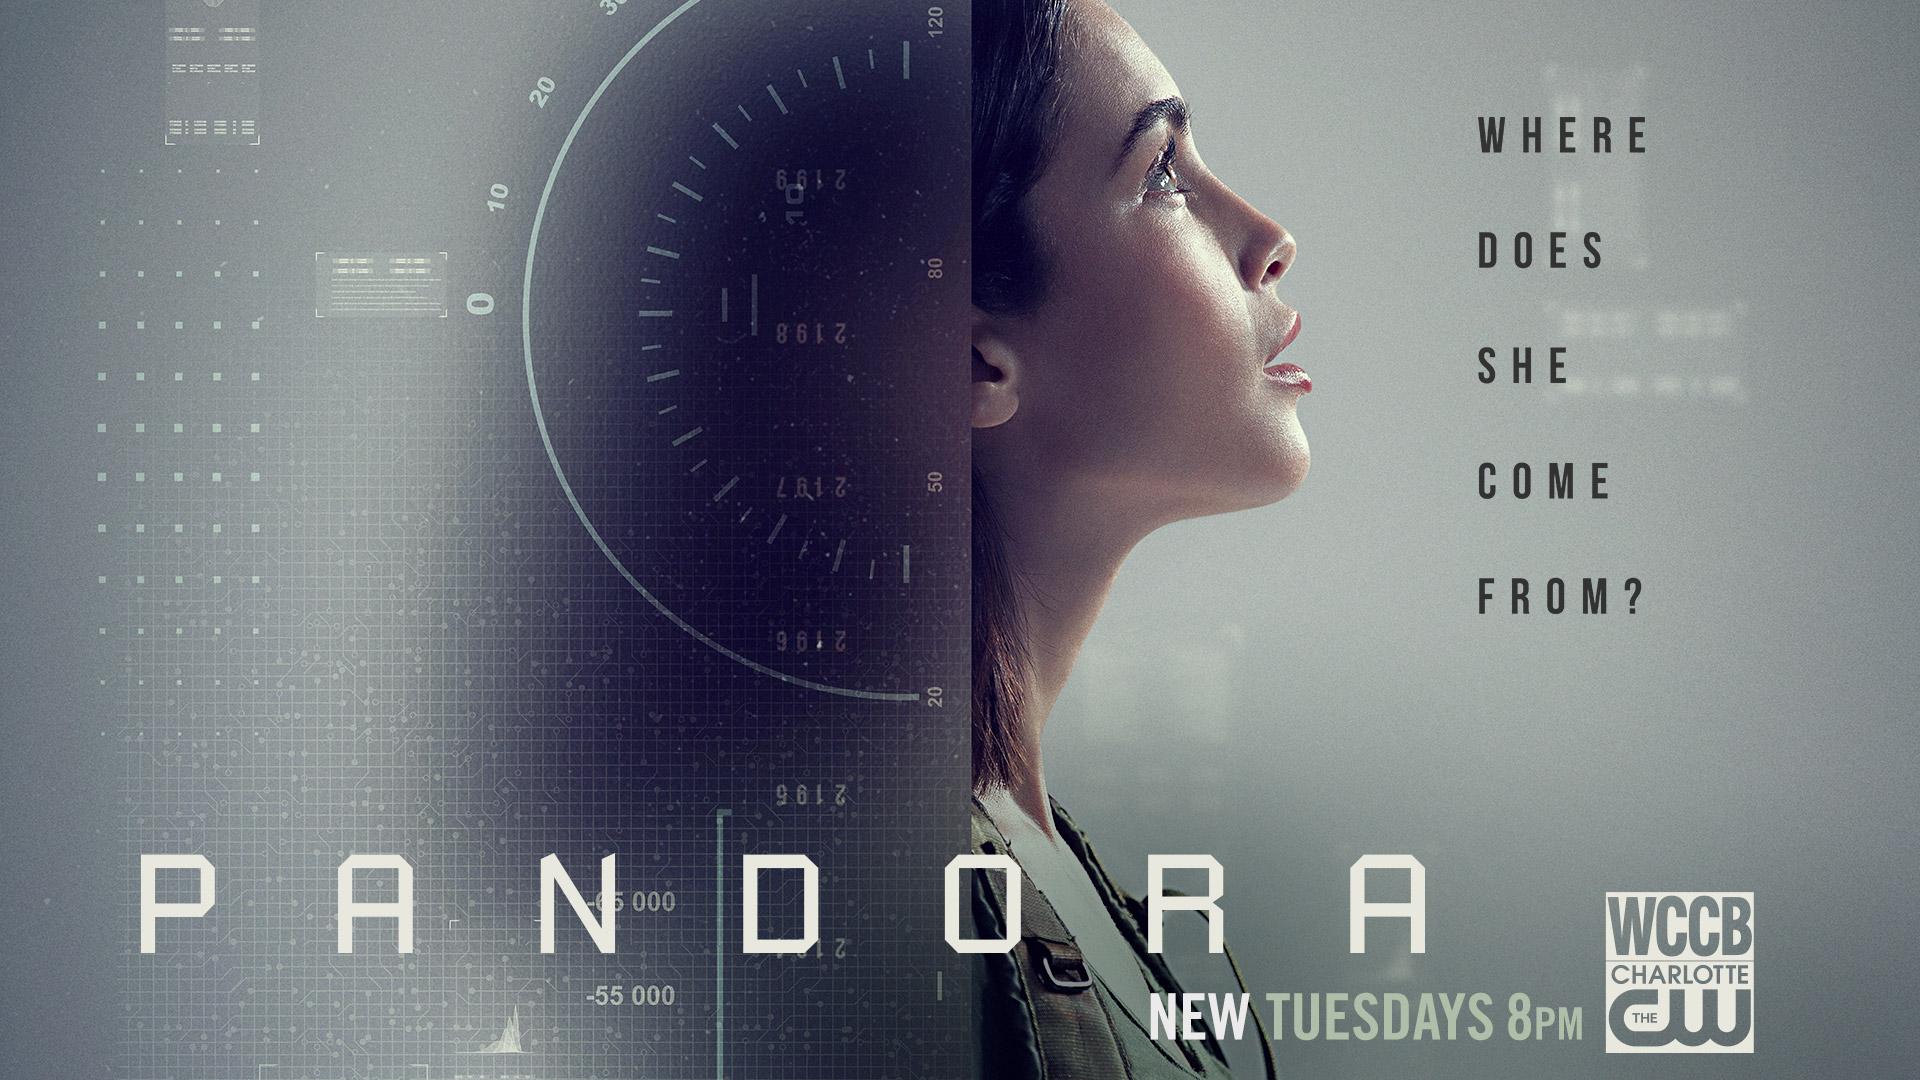 Pandora New Tuesdays at 8PM on WCCB Charlotte's CW